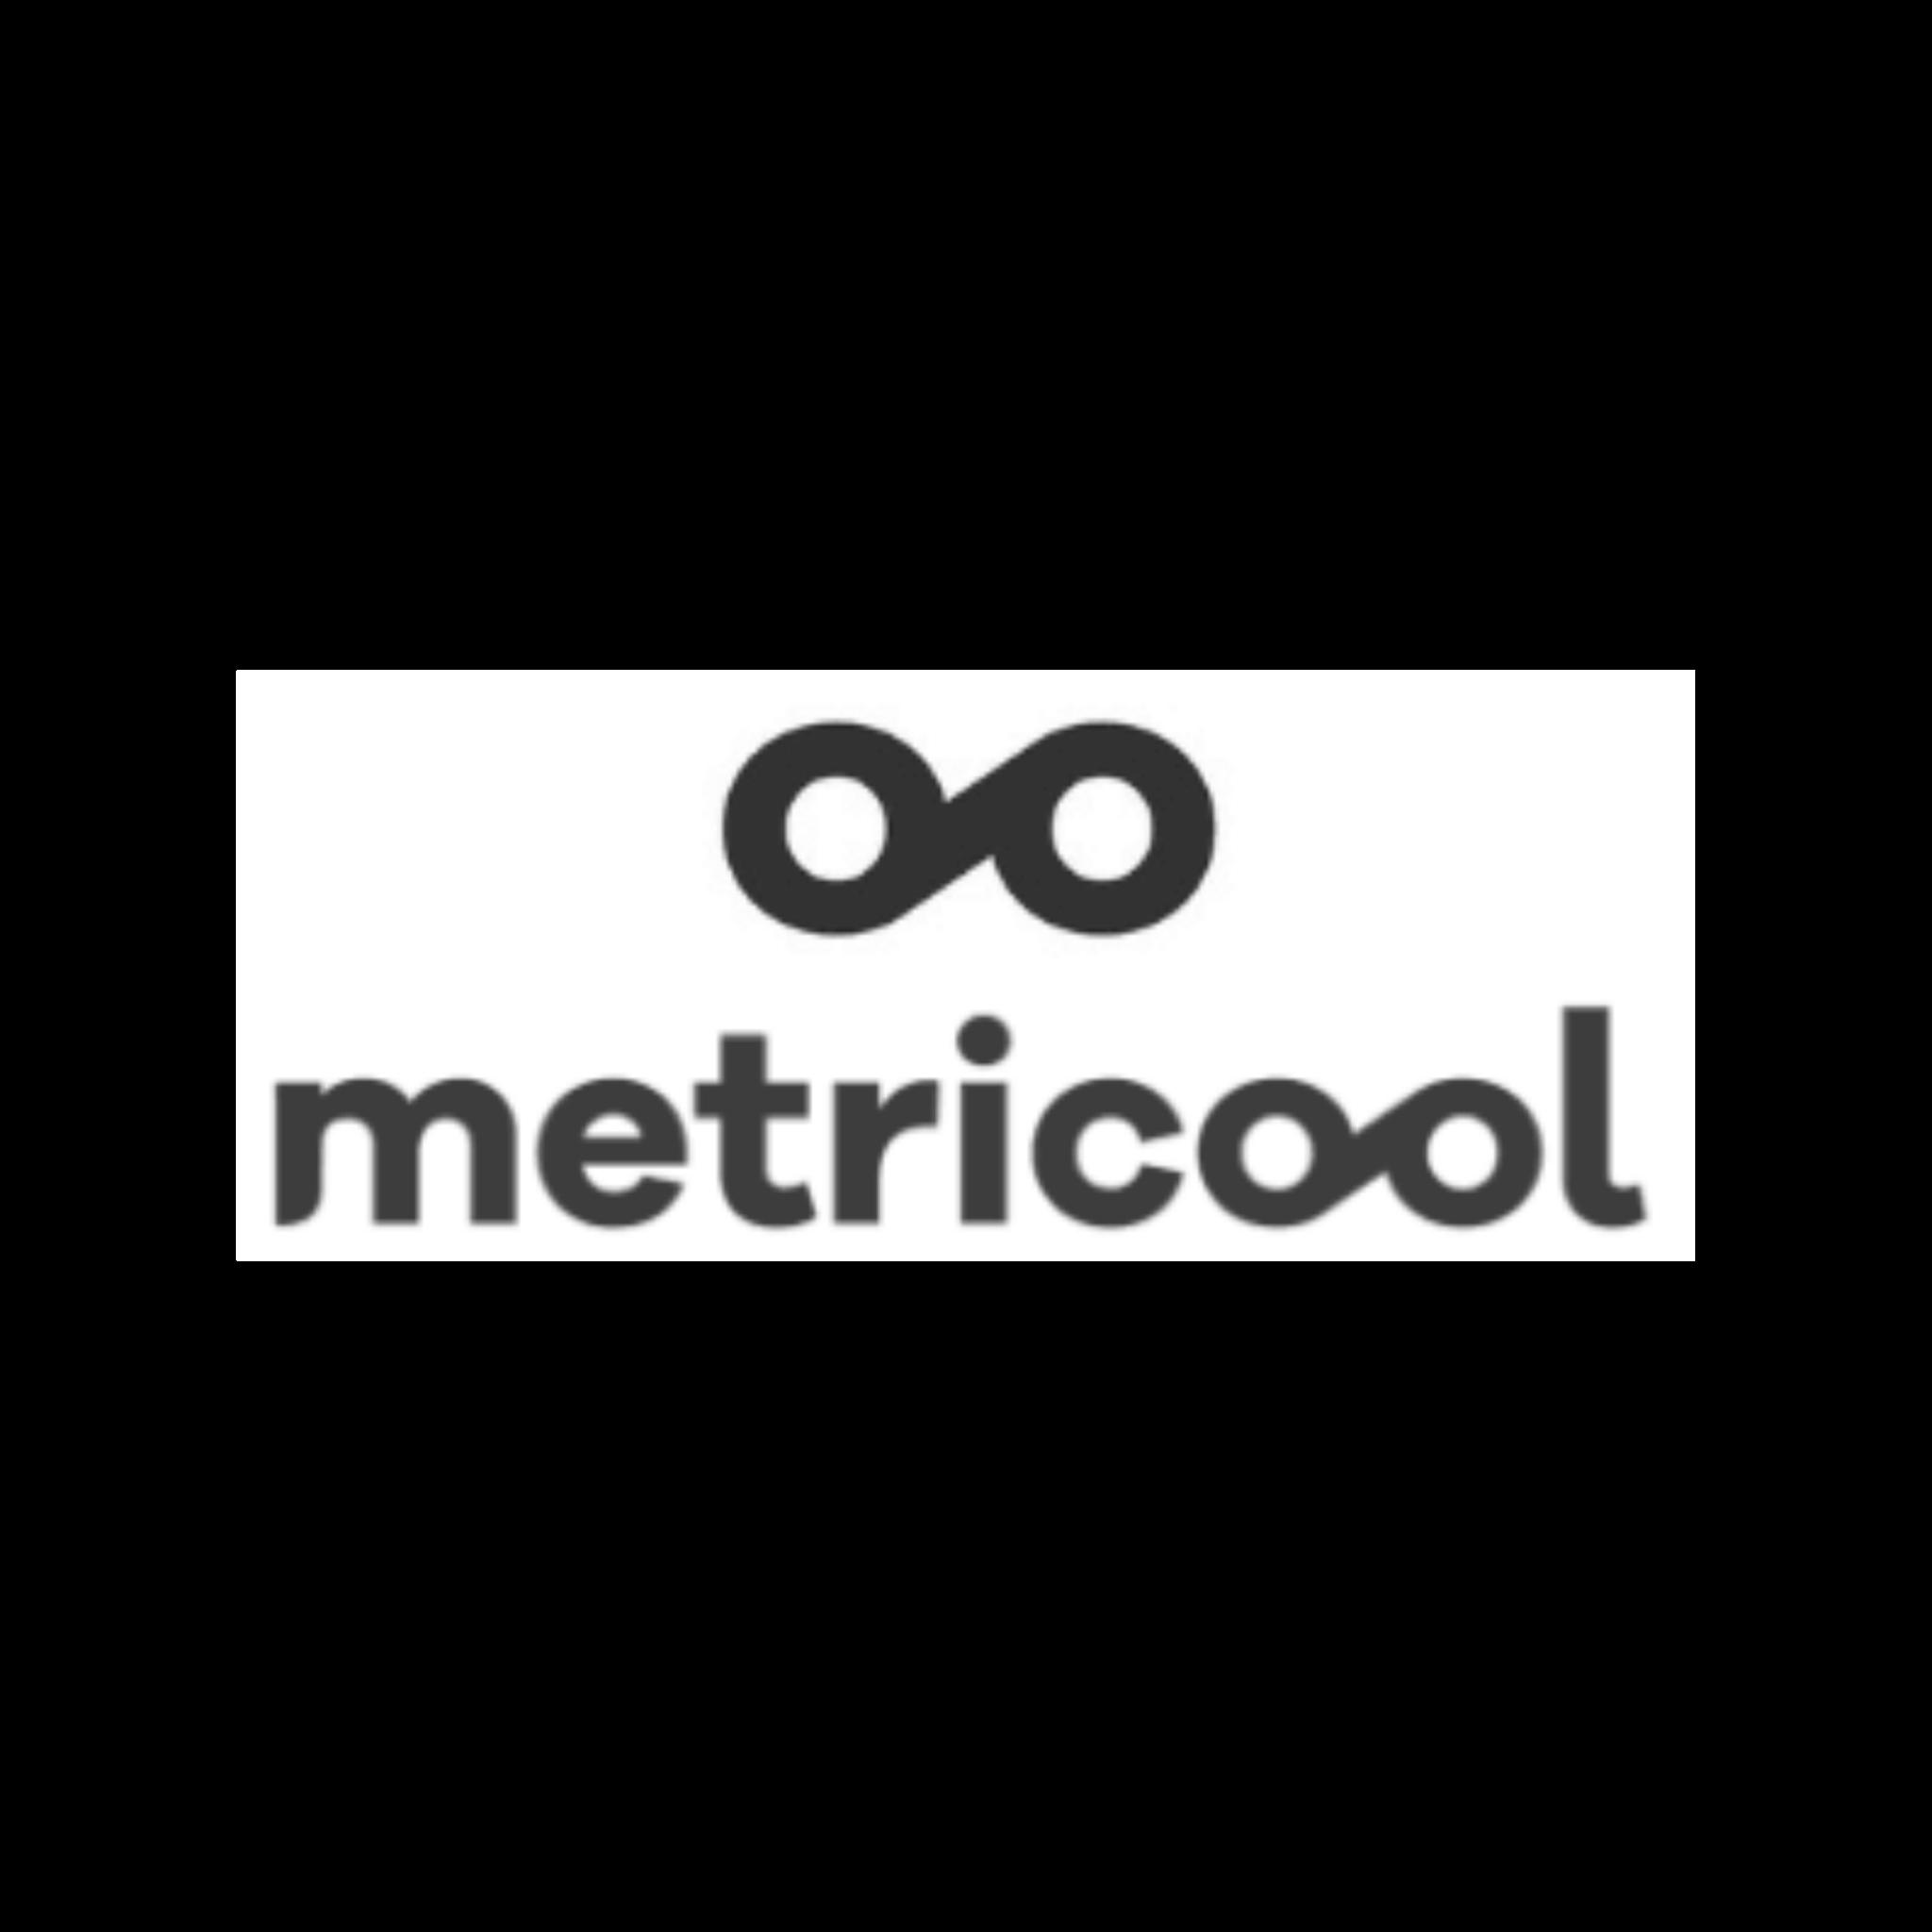 Metricool x Mounir Digital